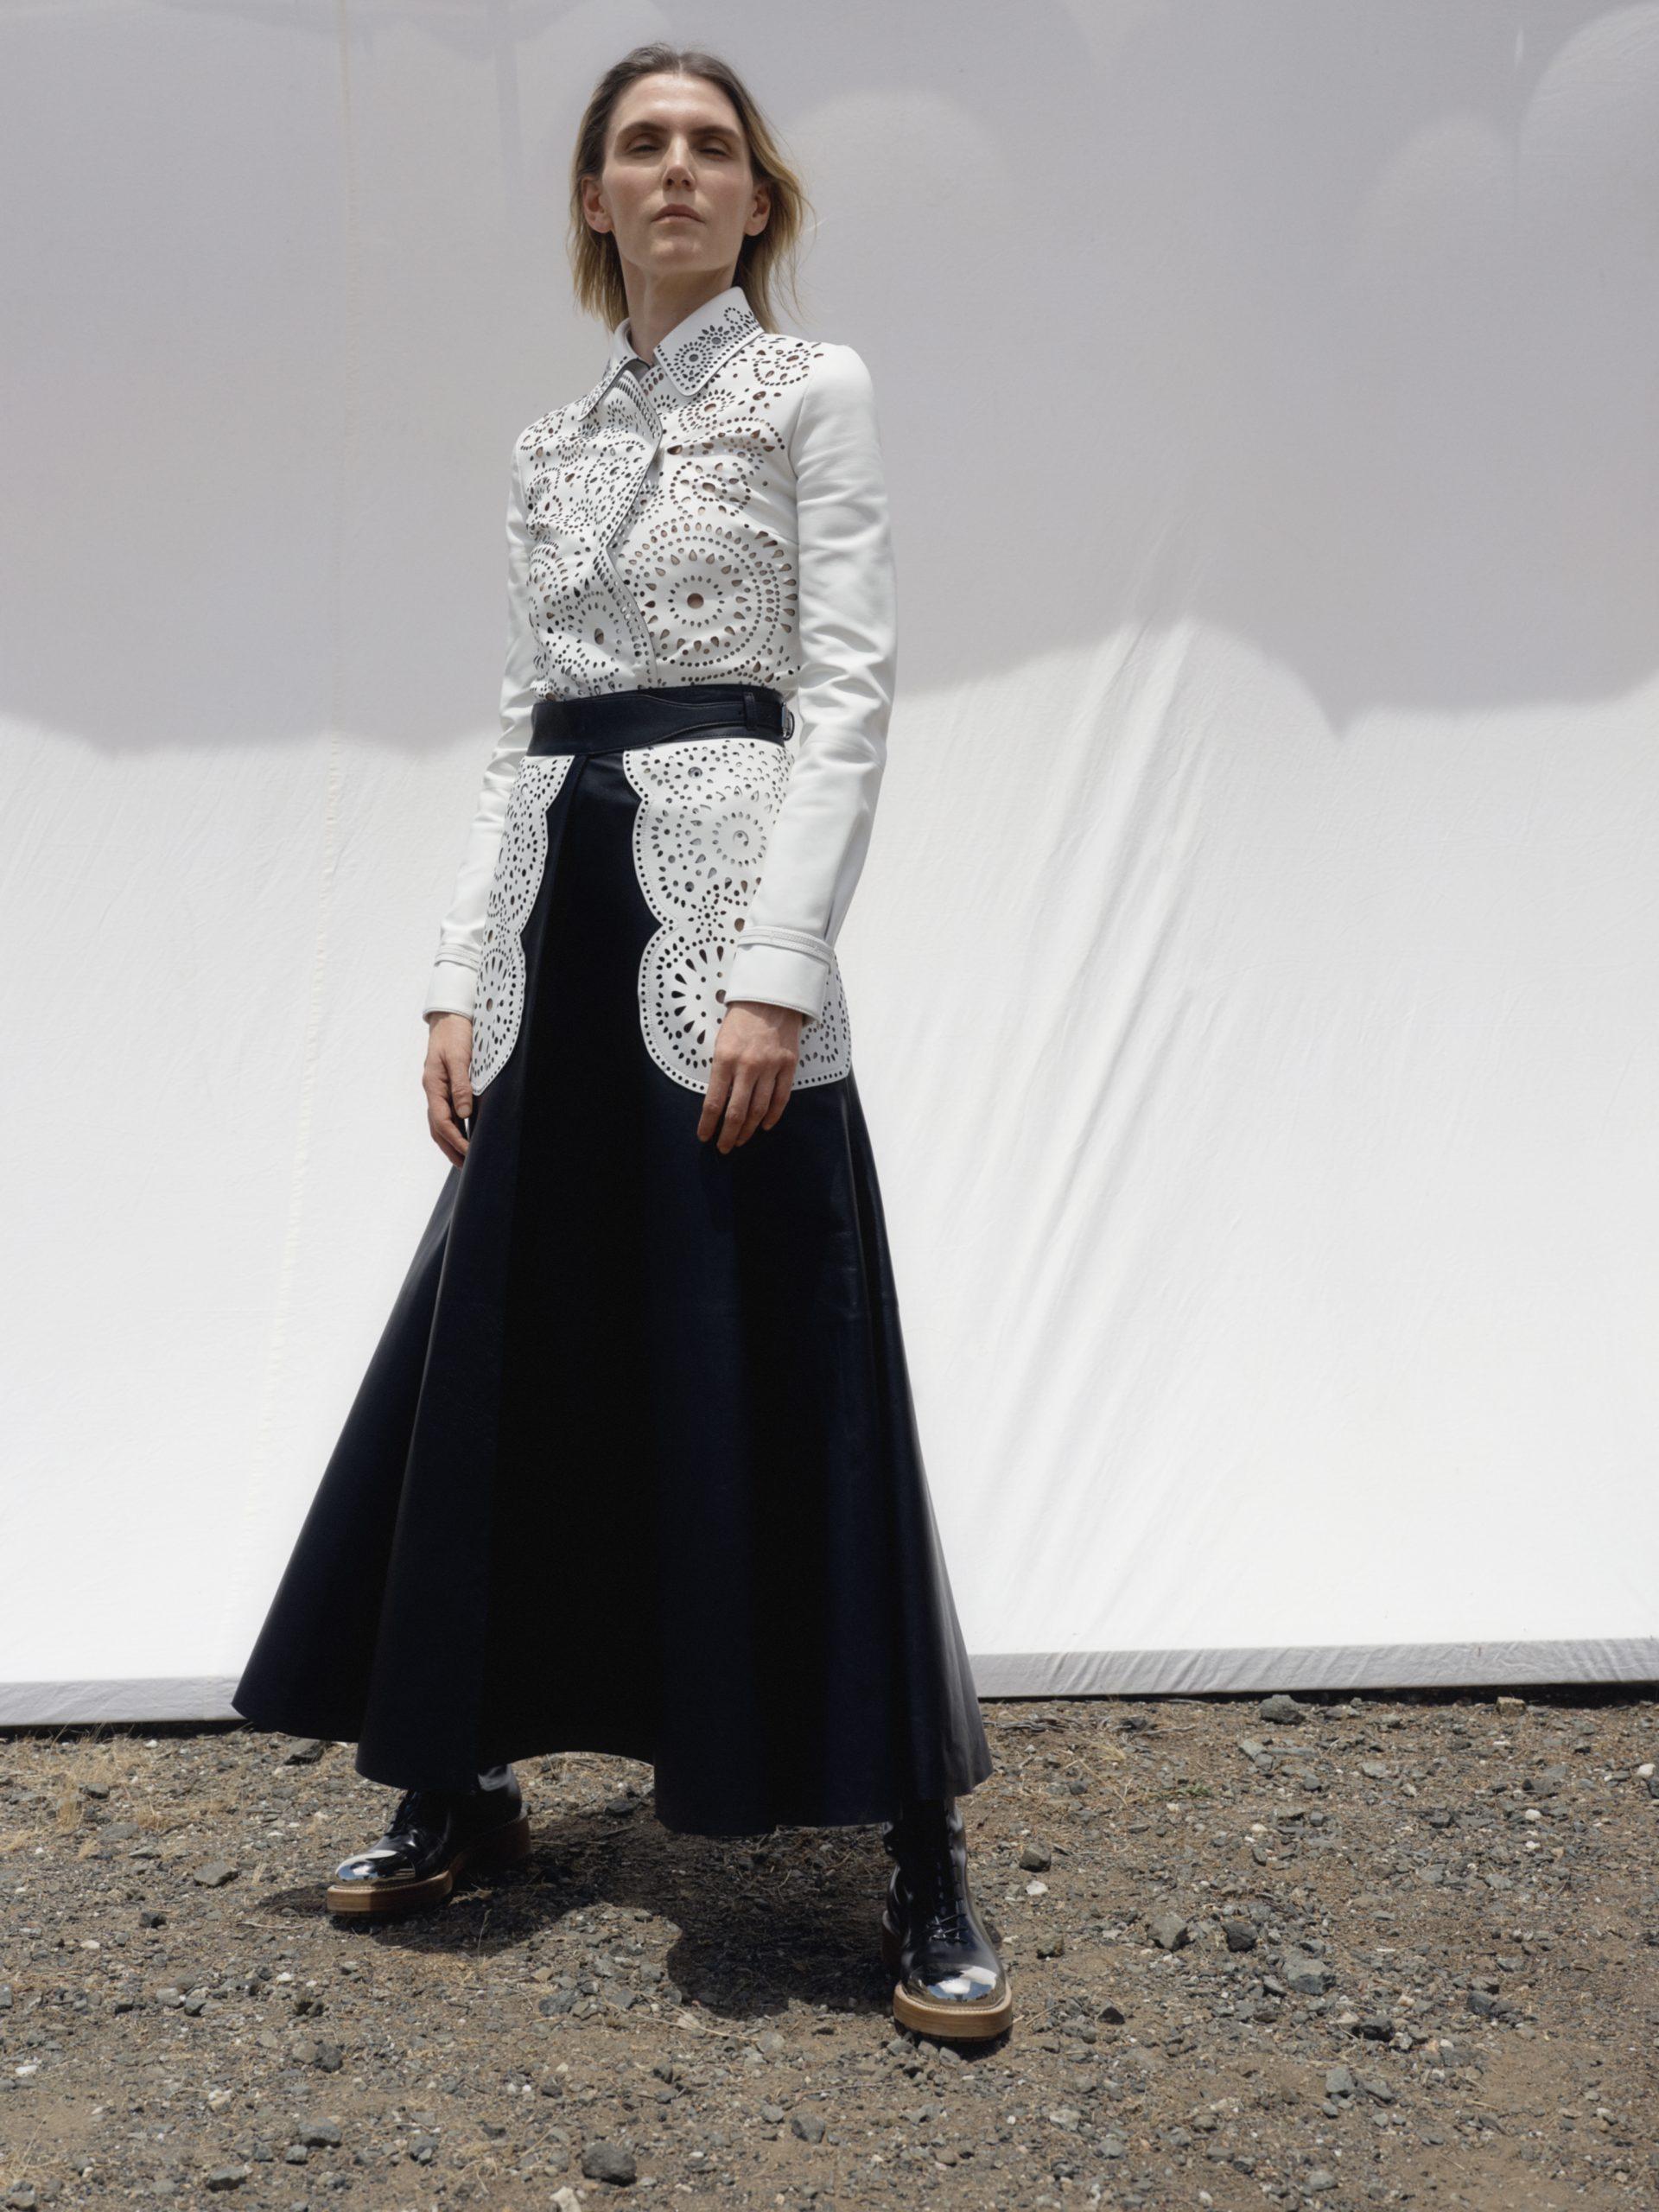 Prairie Dress Spring 2021 Fashion Trend